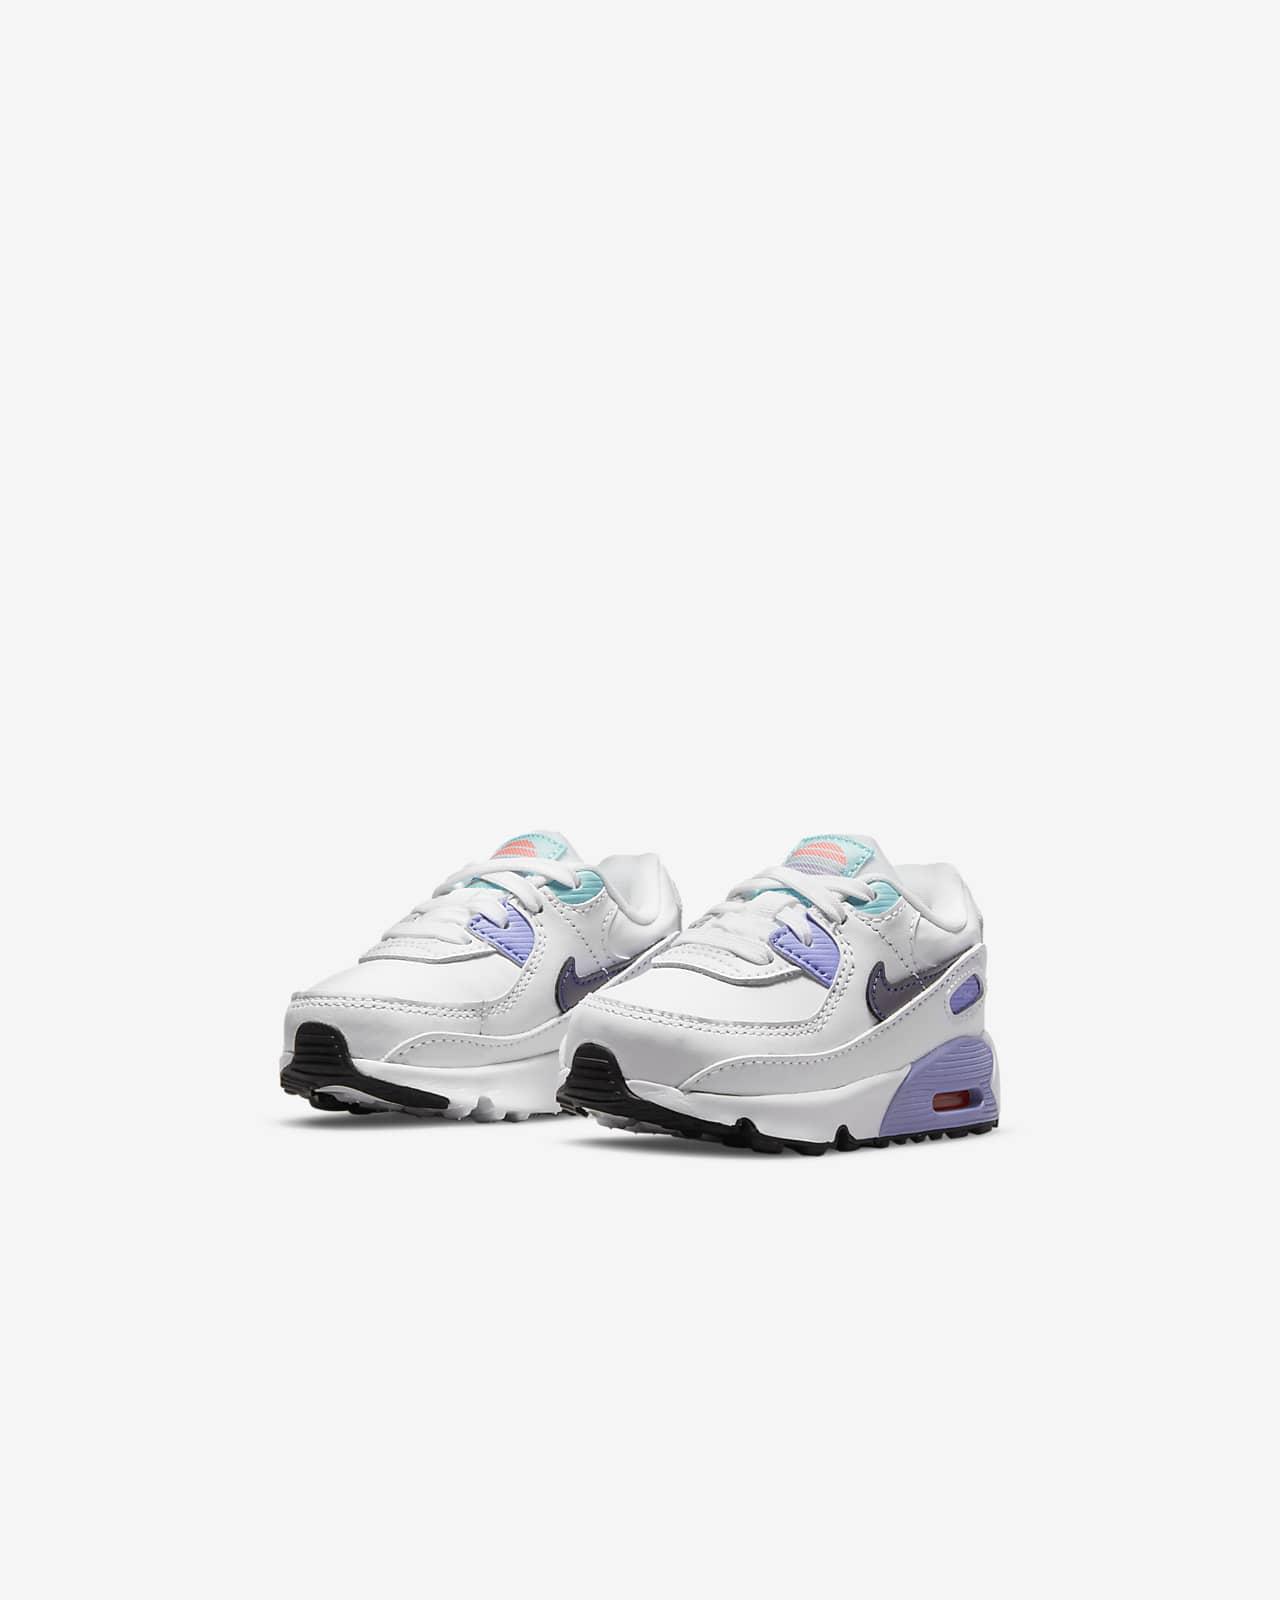 Nike Air Max 90 SE 2 Baby/Toddler Shoes